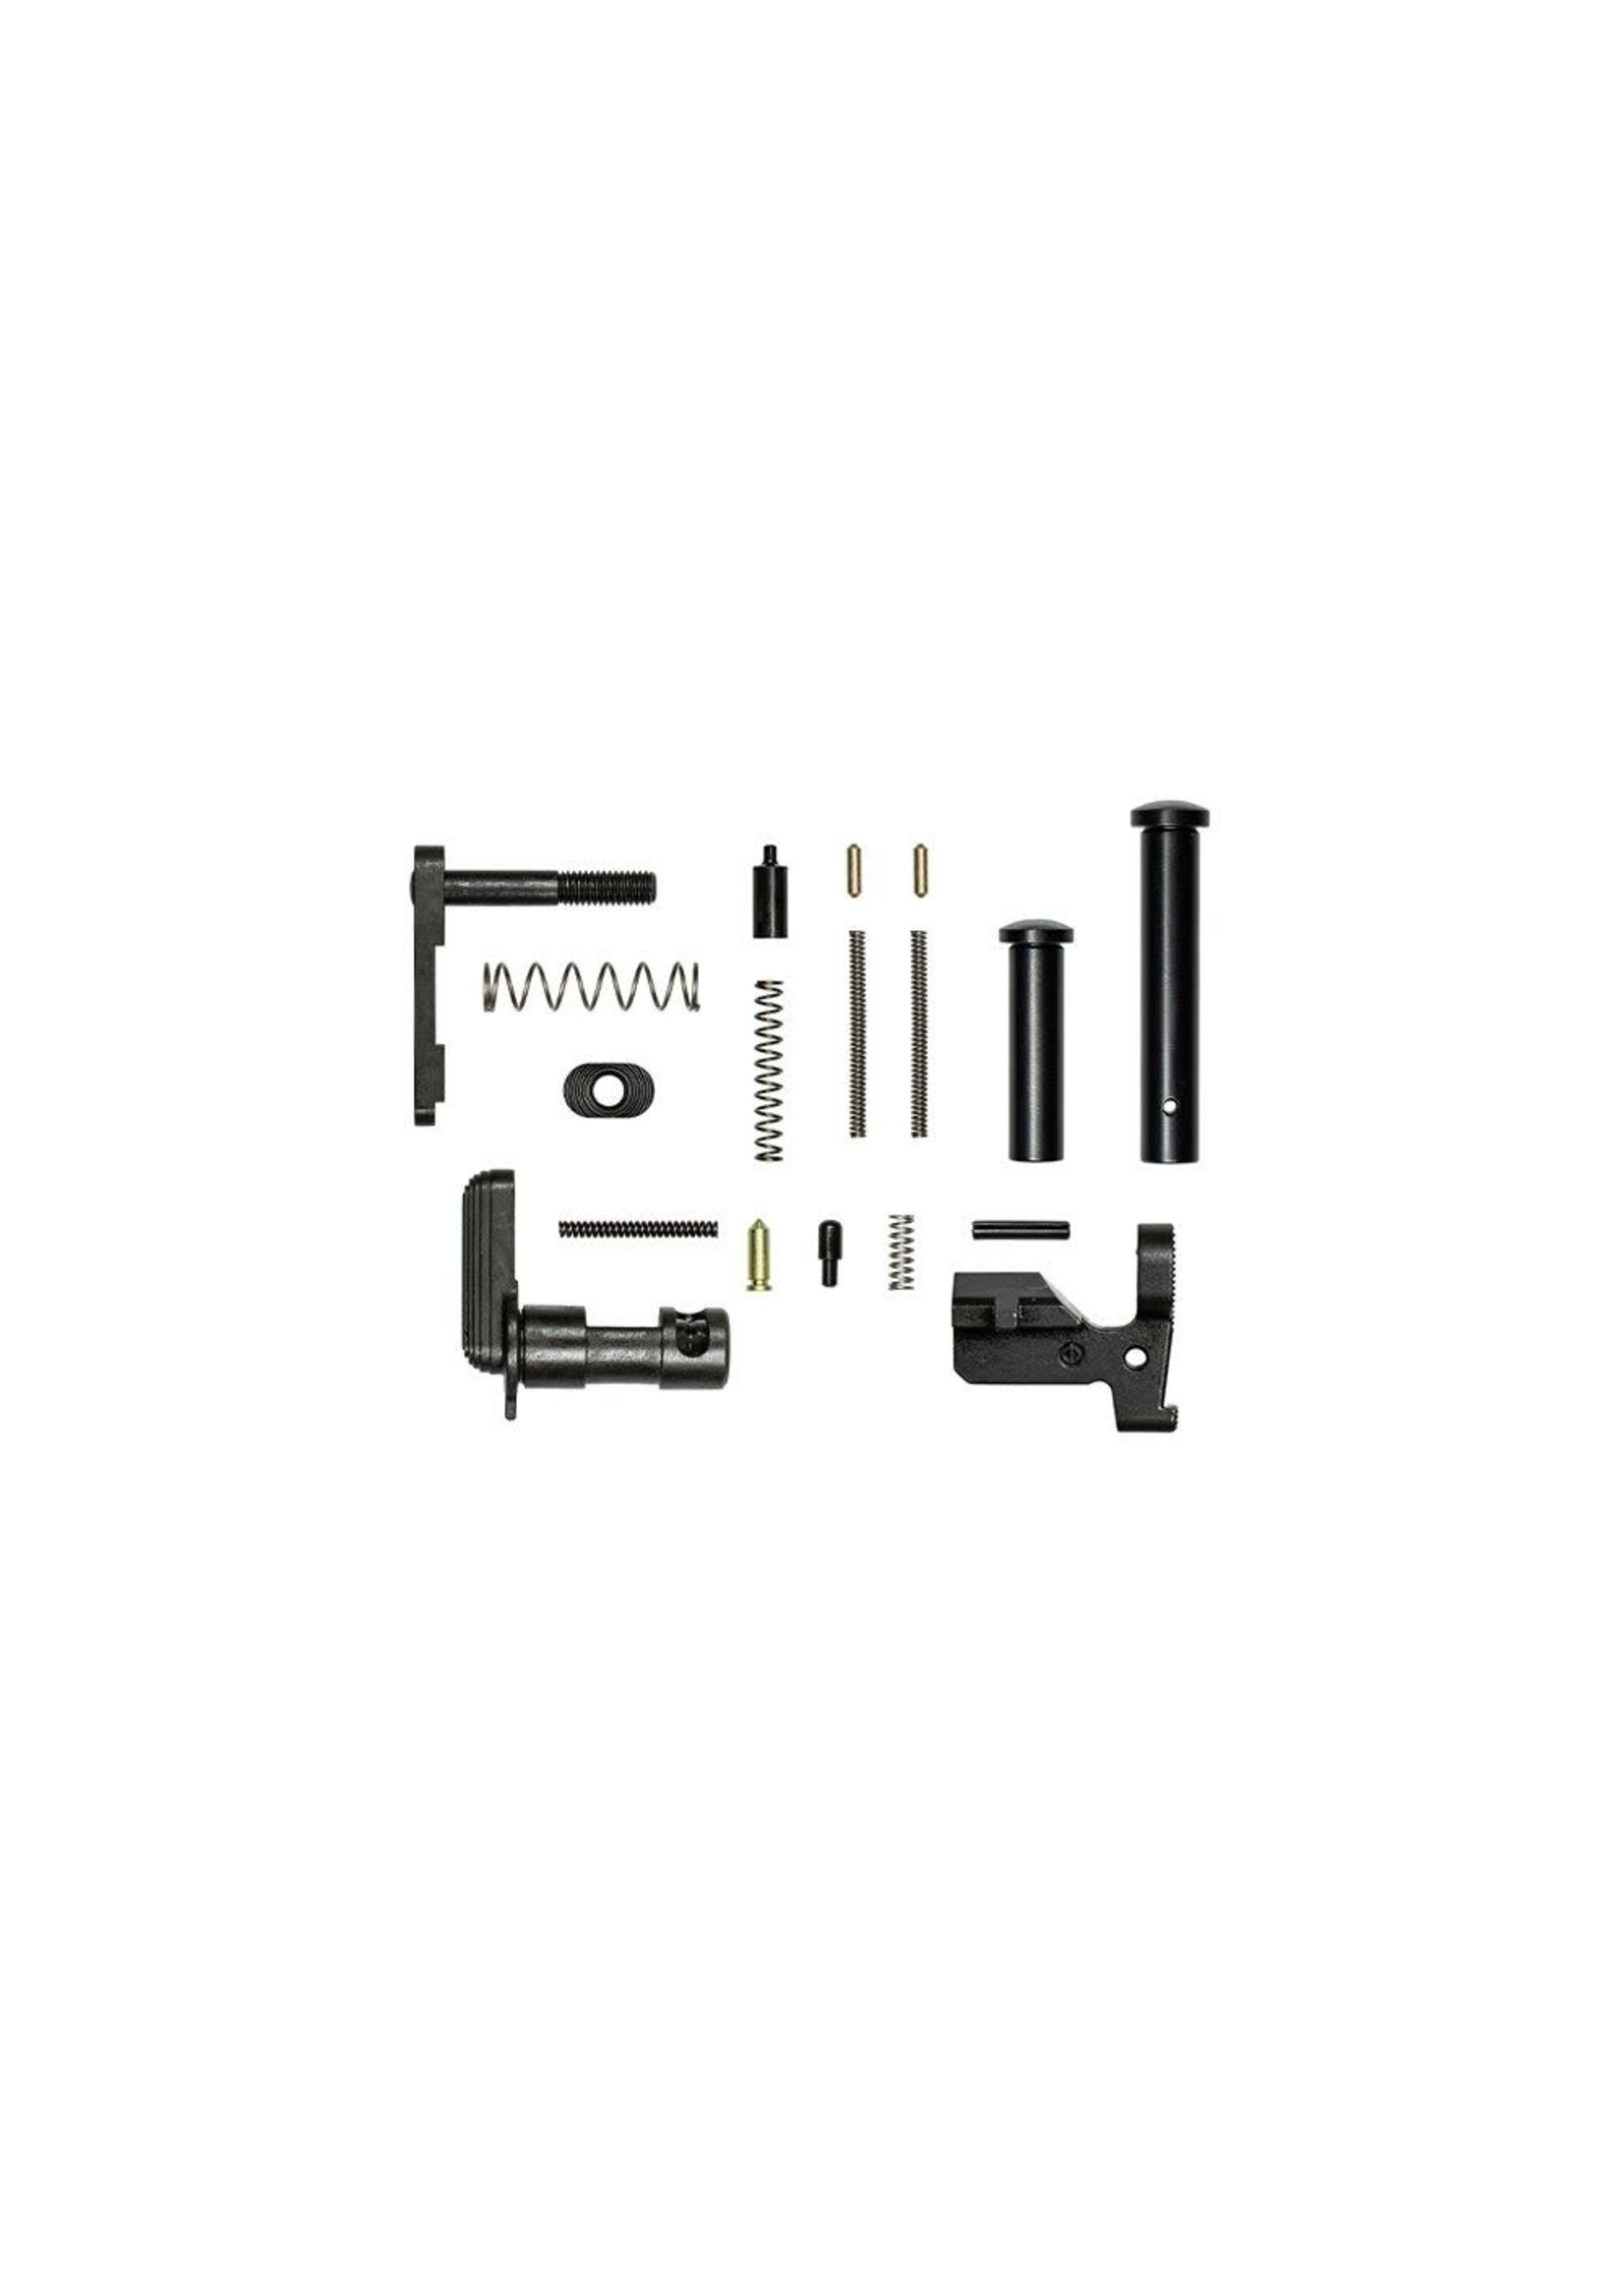 Aero Precision Aero Precision M5 .308 Lower Parts Kit, Minus FCG/Pistol Grip